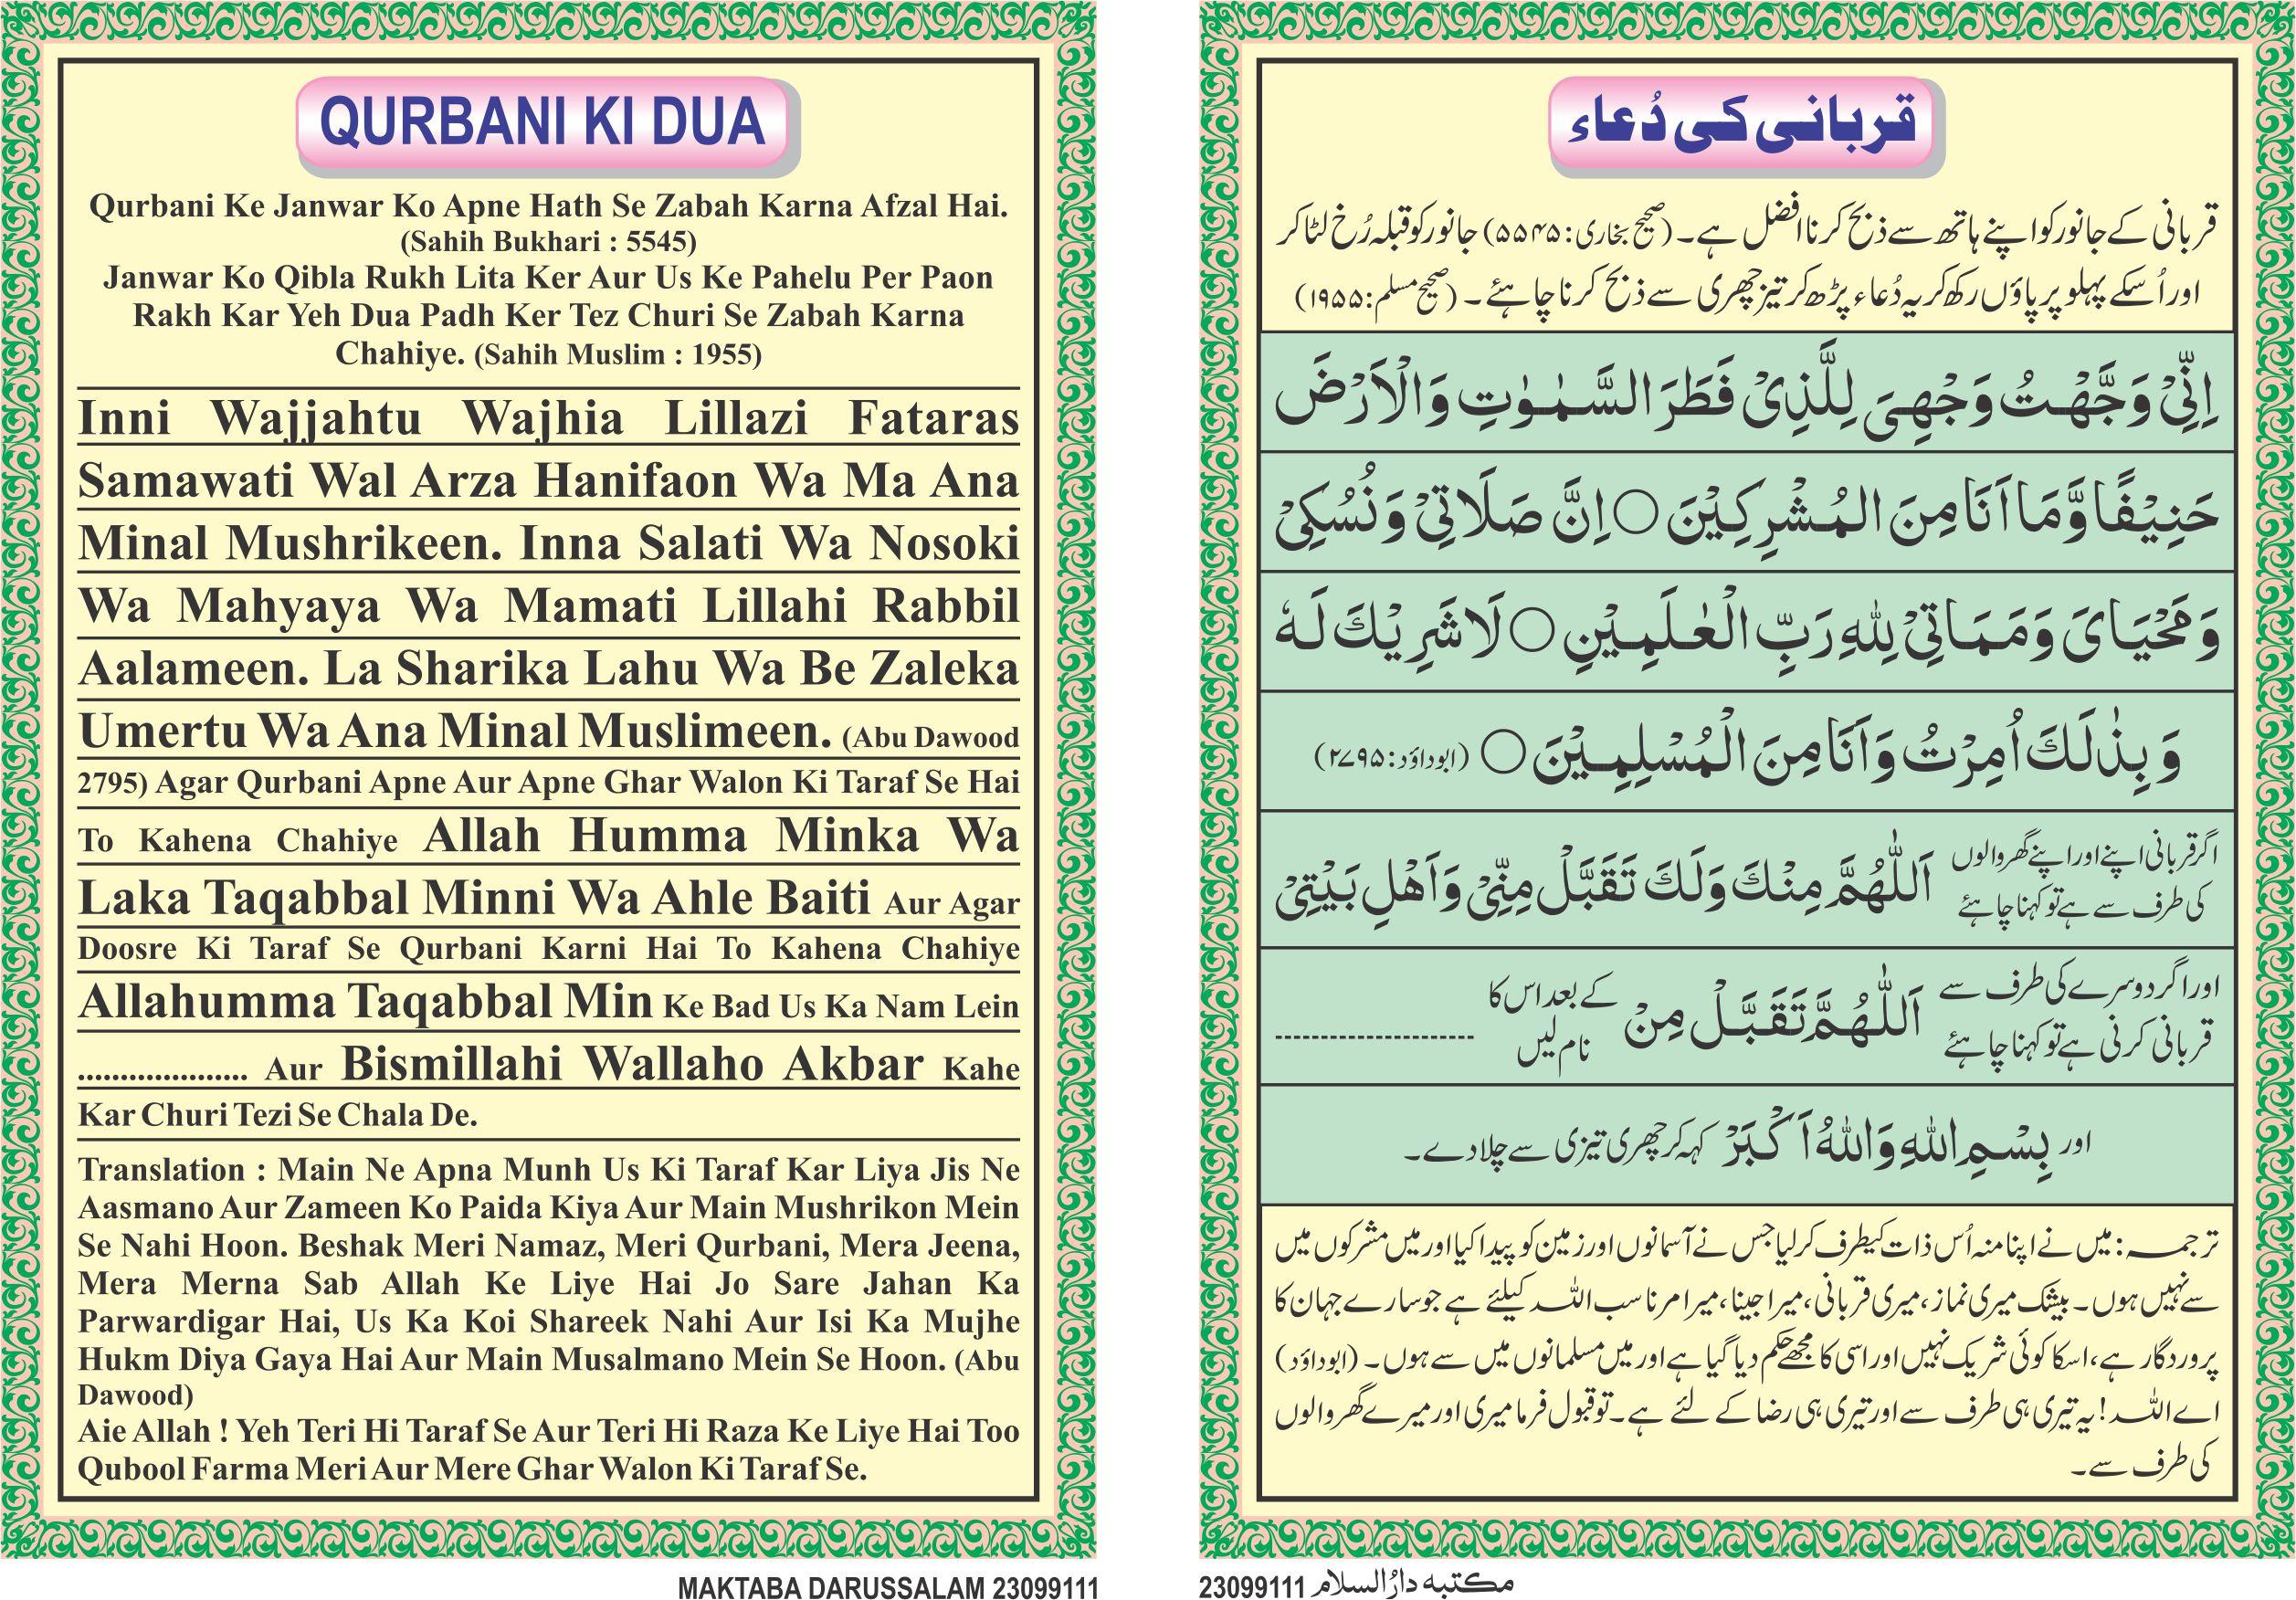 Qurbani Ki Dua.jpg